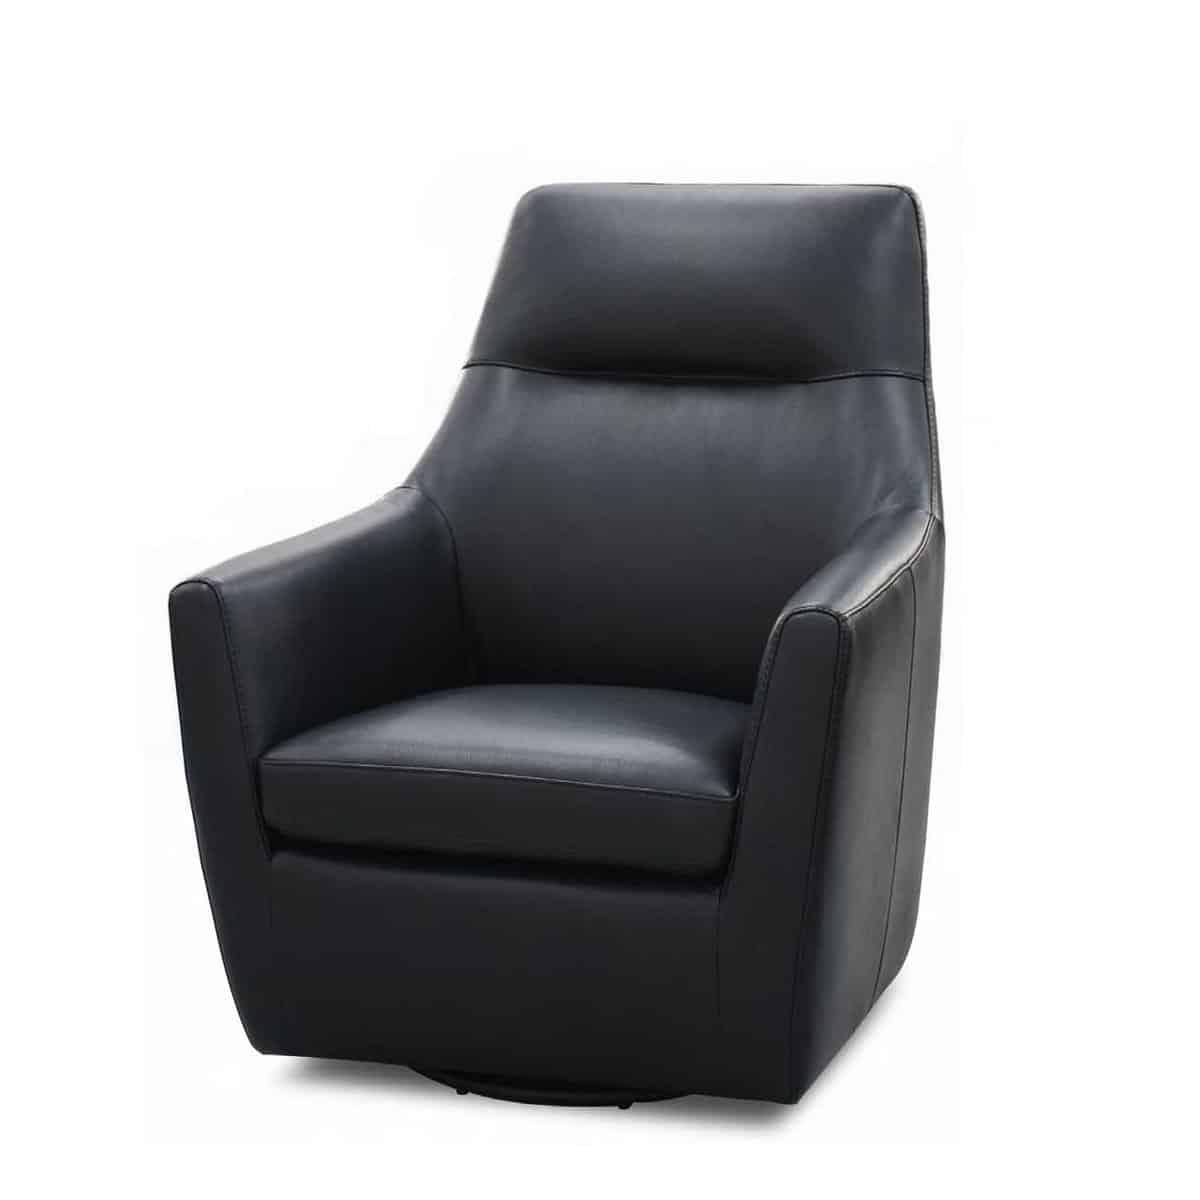 Glb0225 Contemporary Swivel Chair House Of Denmark House